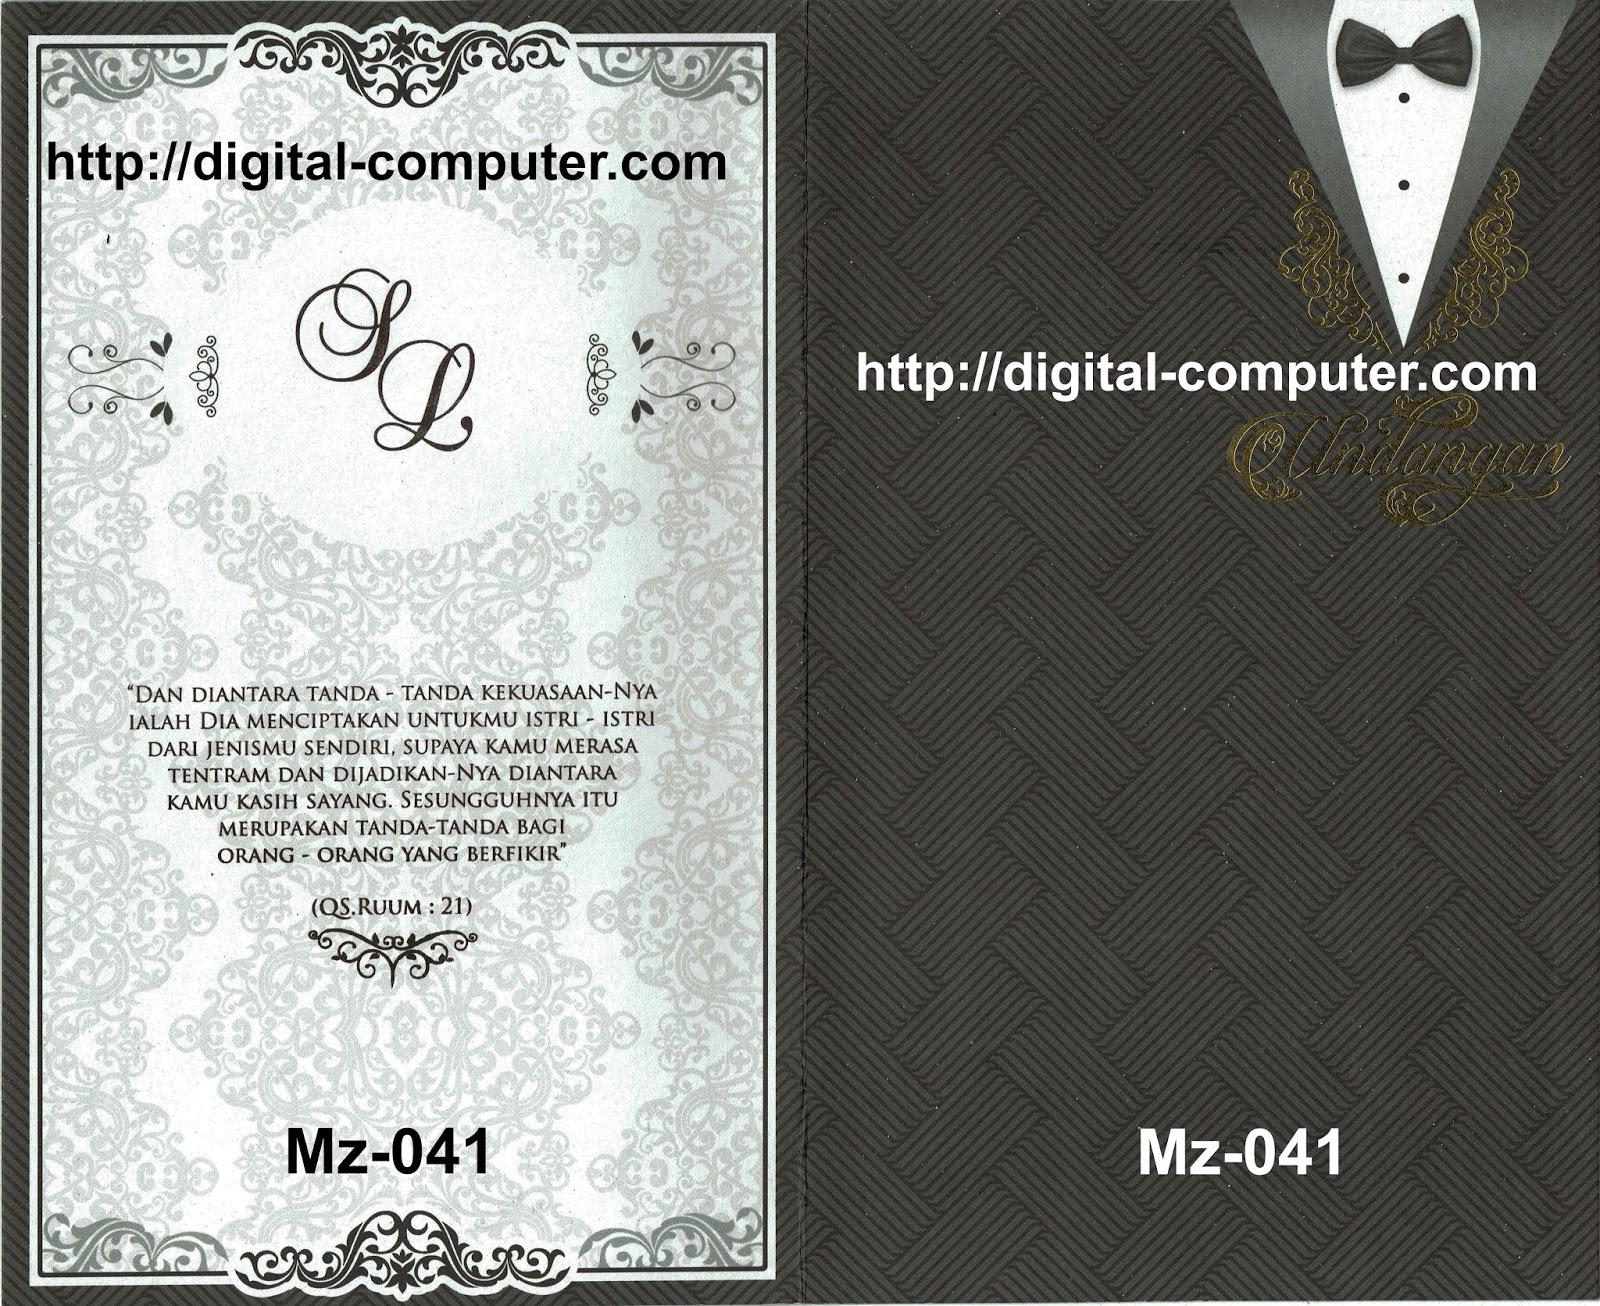 Undangan Softcover Mz-041